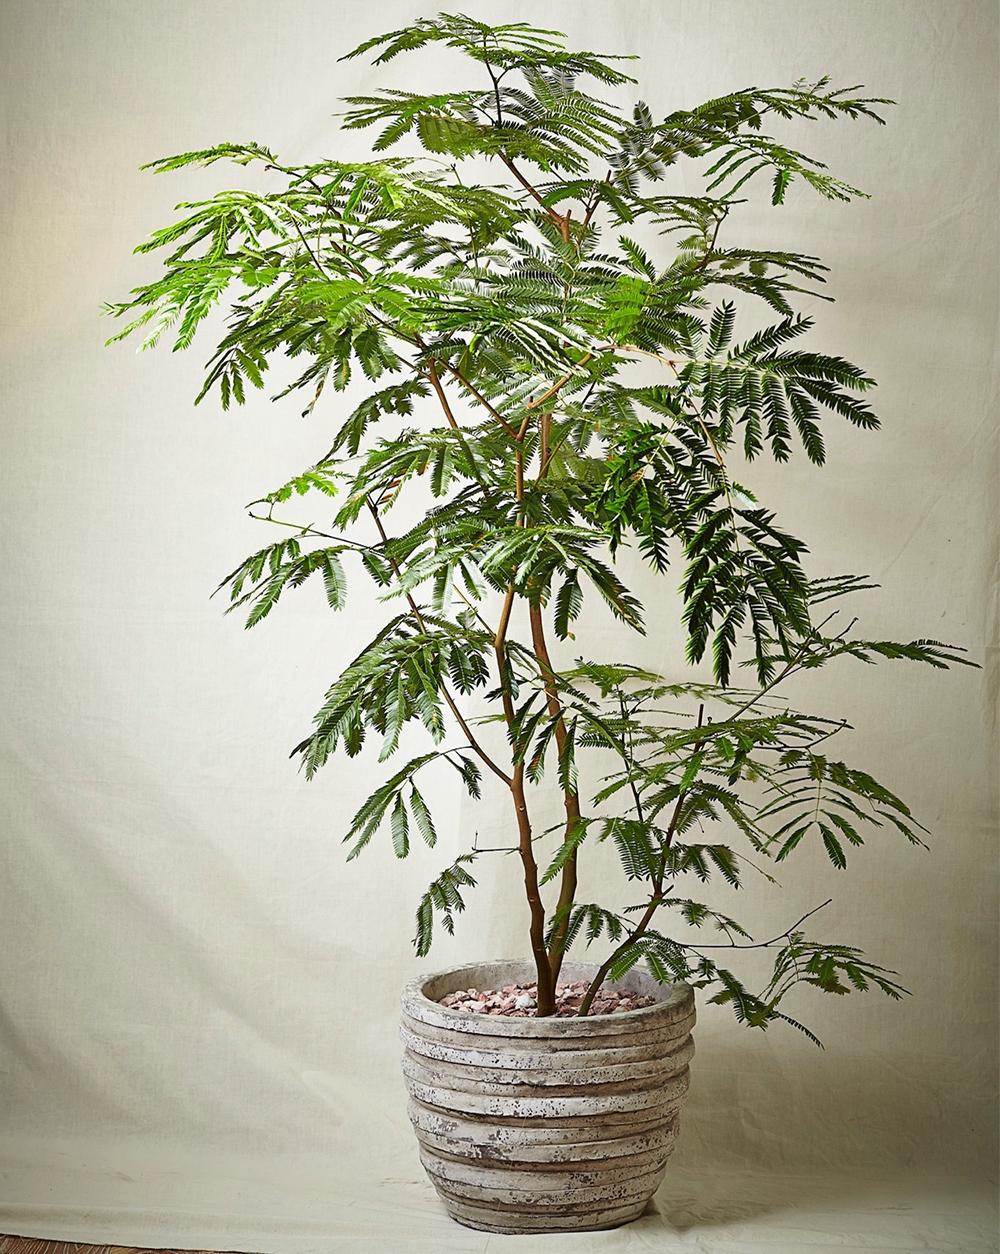 hacknewlife-foliage-plant21